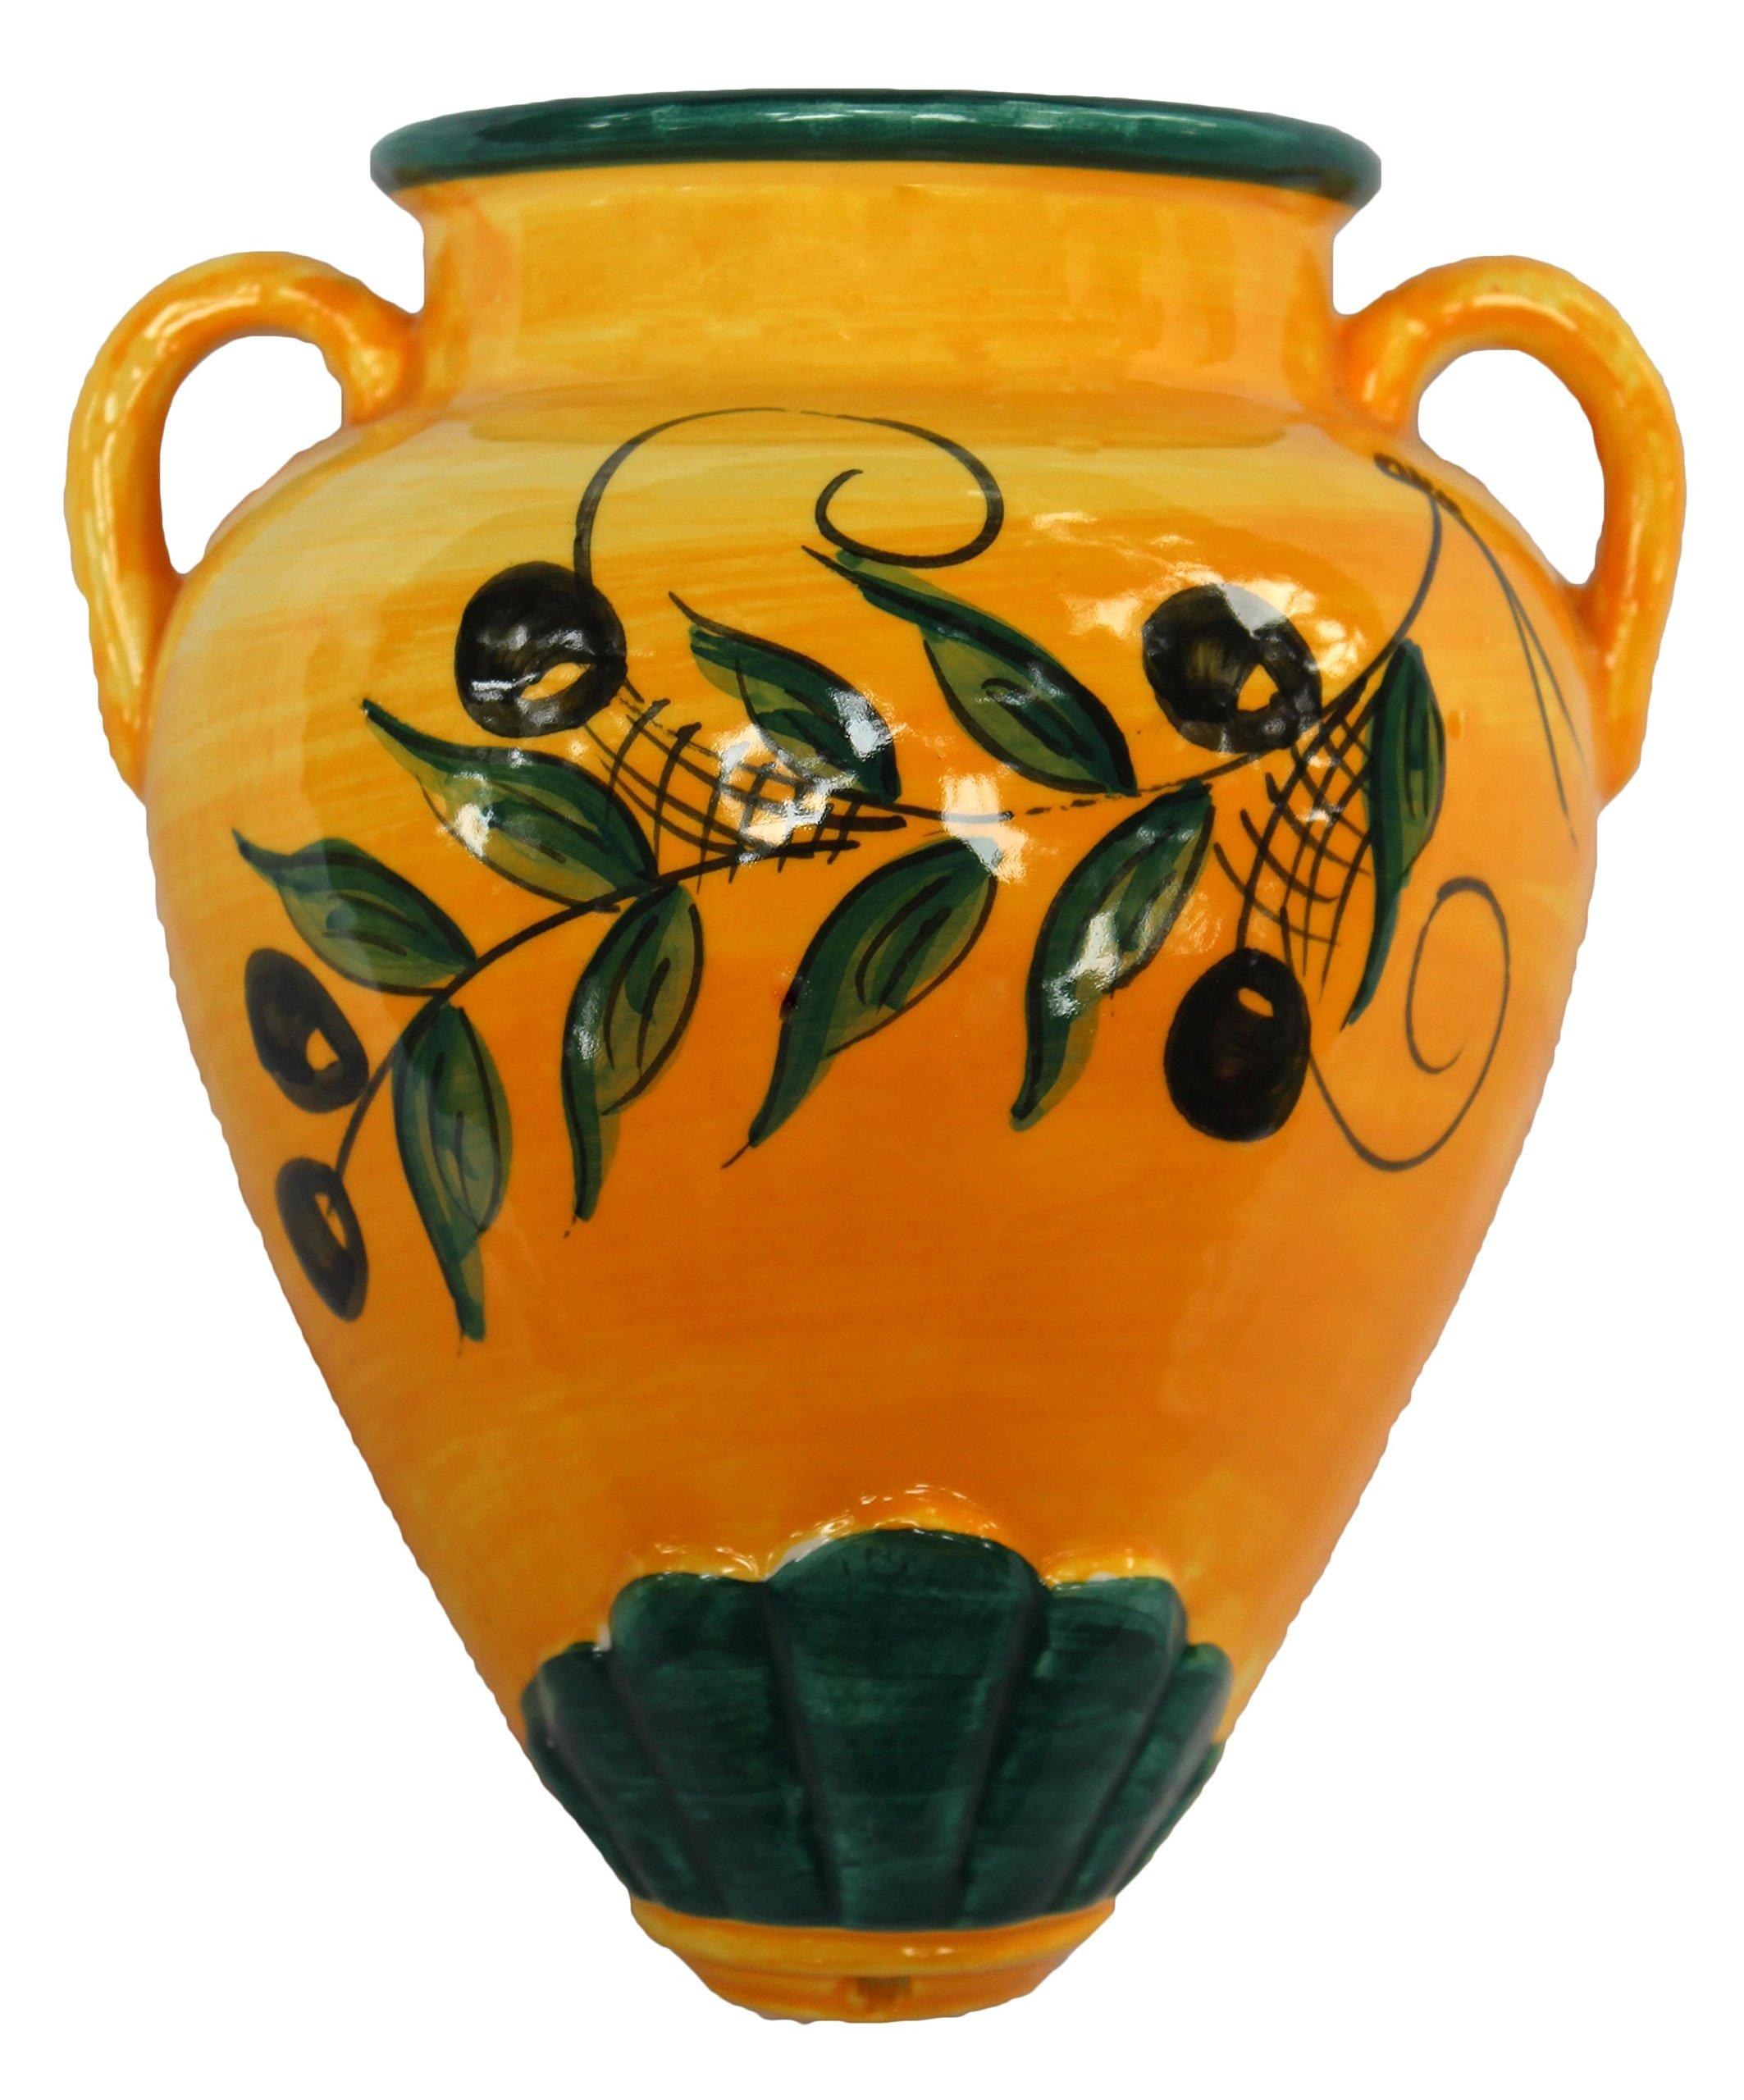 Cactus Canyon Ceramics Wall Flower Pot - Spanish Tinaja - Olivas - Hand Painted in Spain